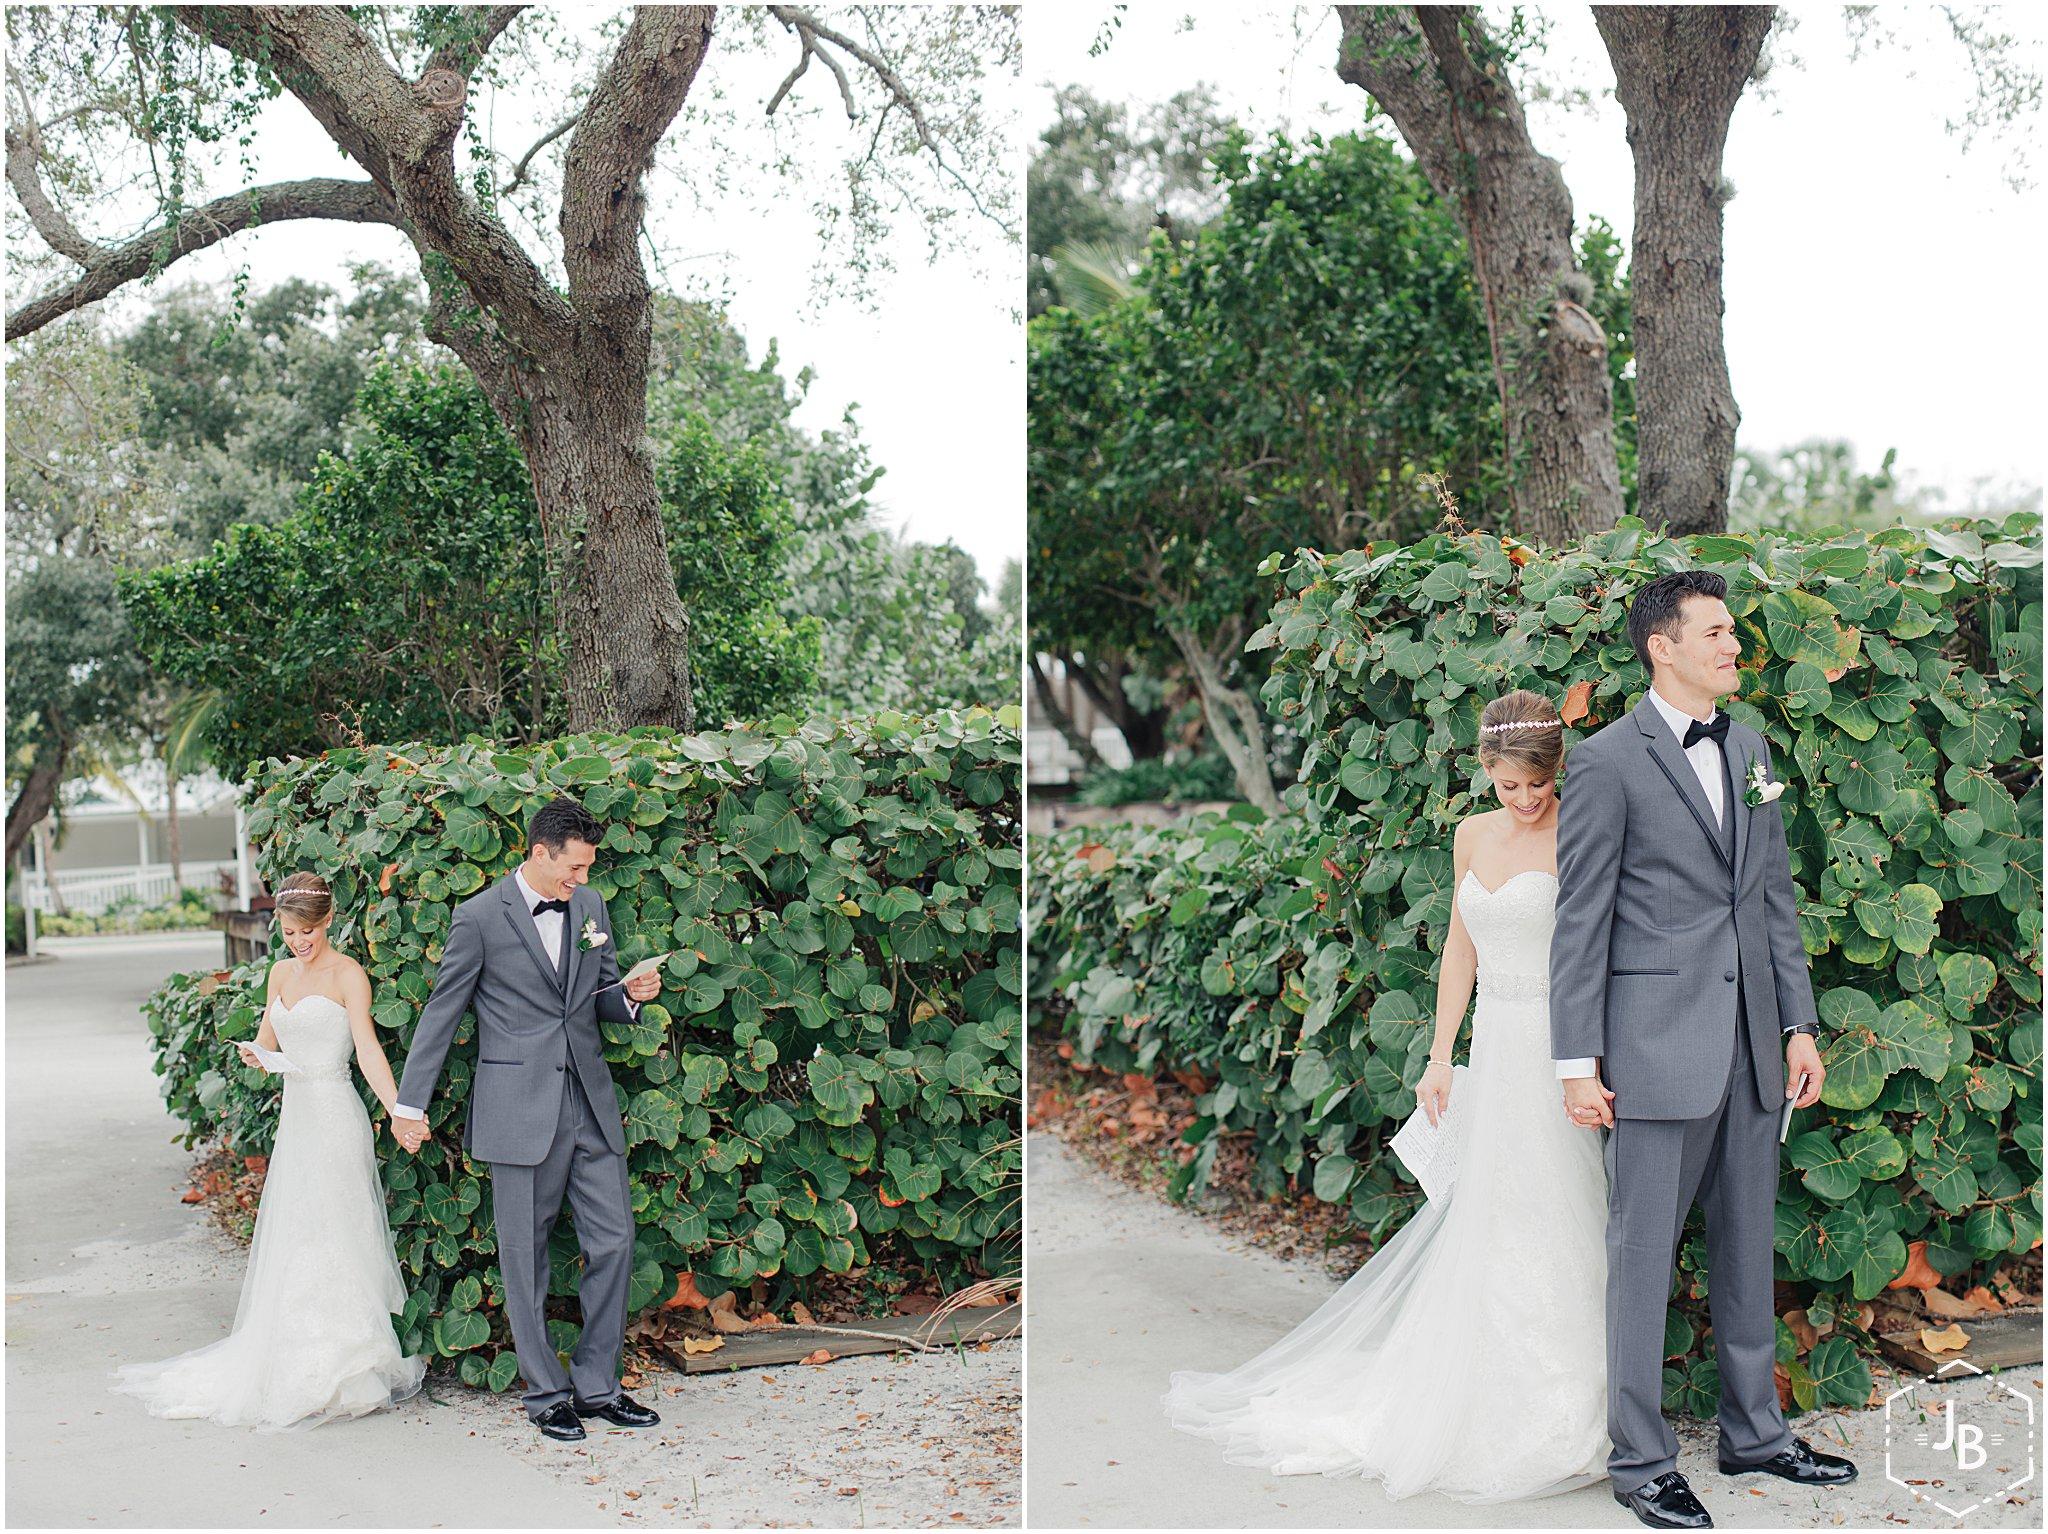 WeddingandEngagementFloridaPhotographer_0331.jpg